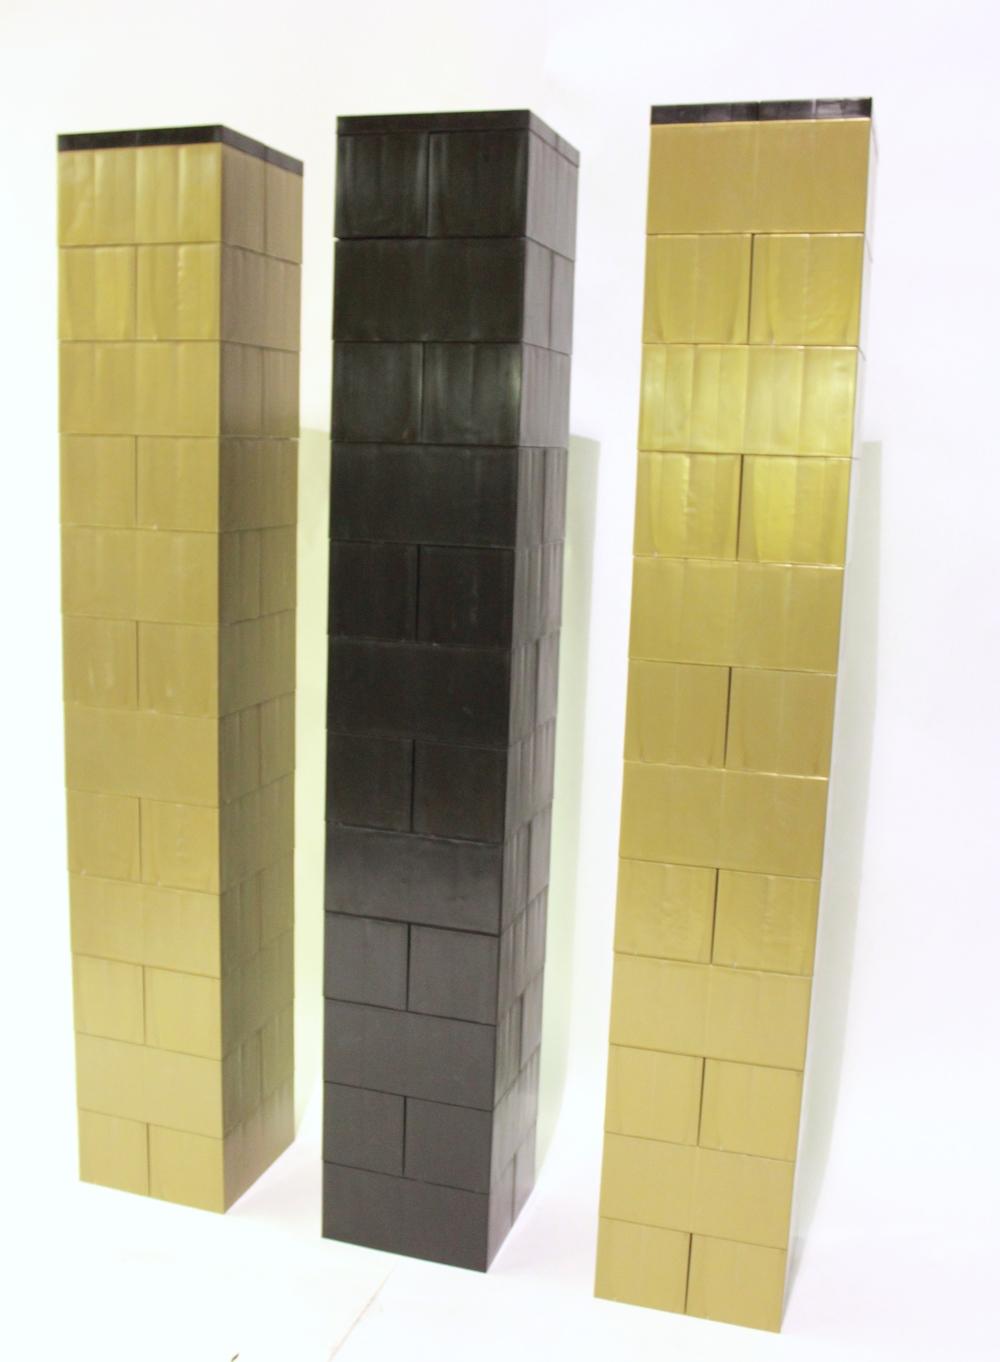 Modular columns